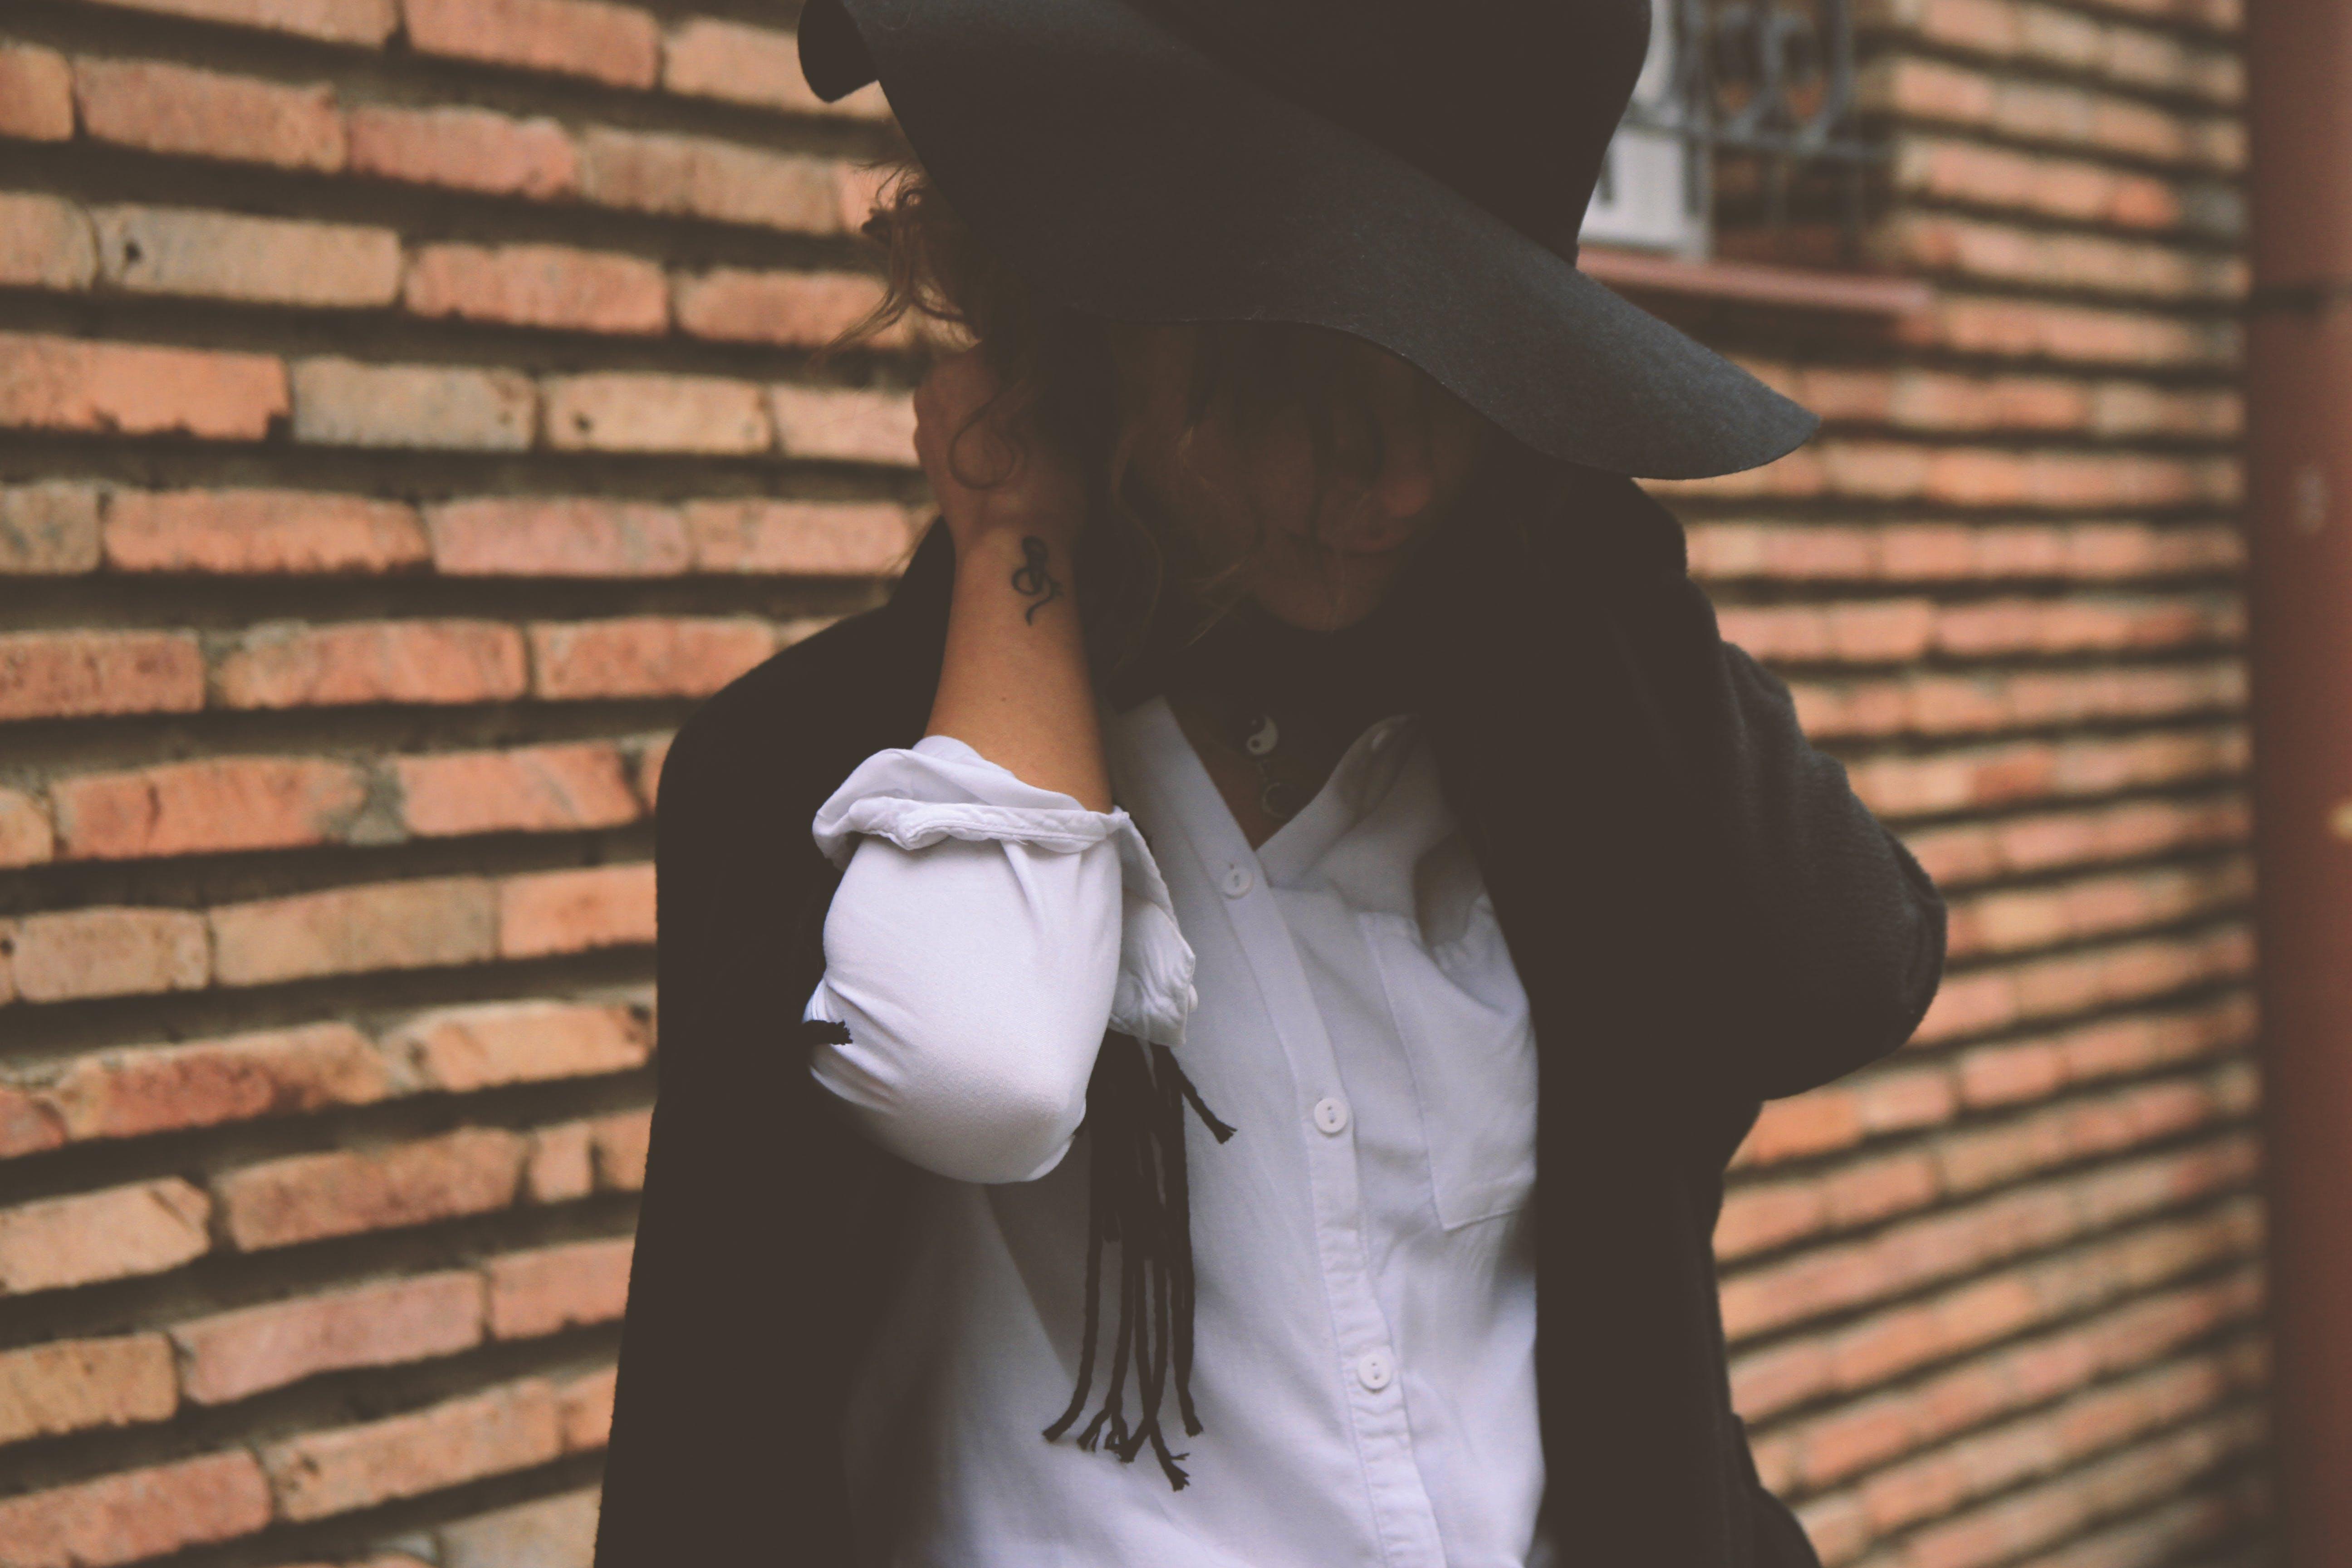 Woman Wearing White Dress Shirt and Black Coat